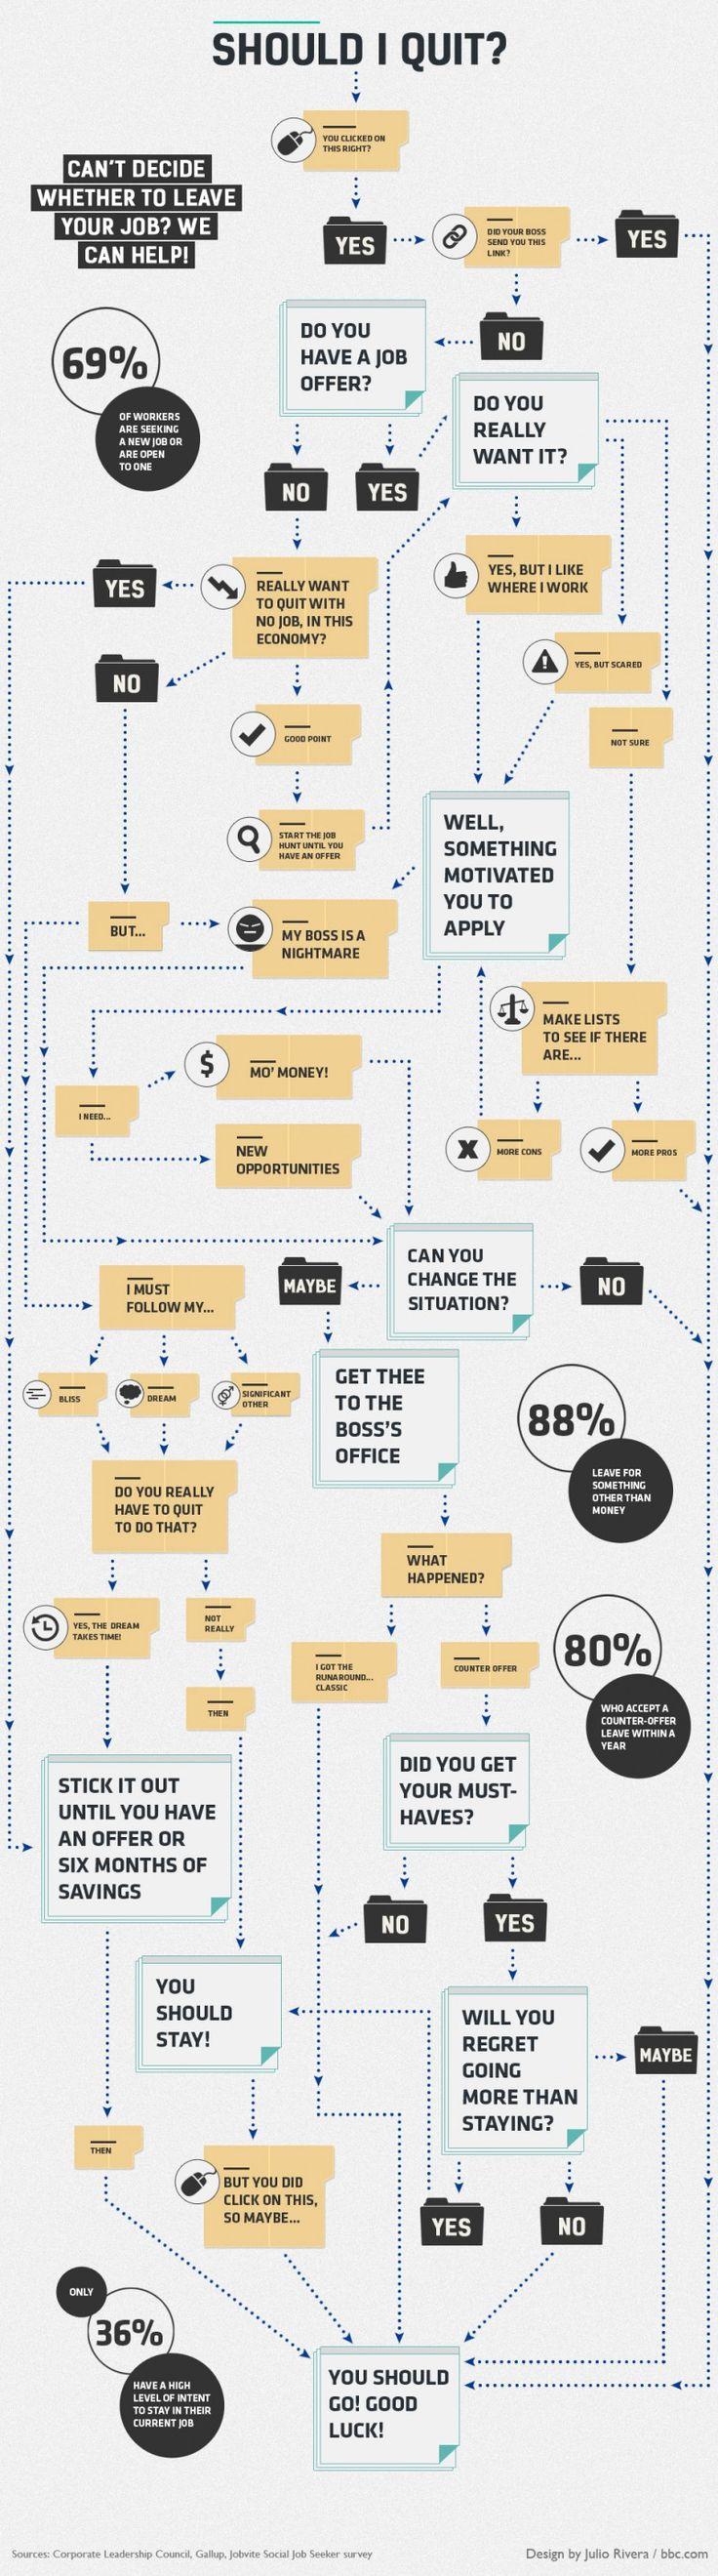 Should You Quit Your Job? This Flowchart Will Help You Decide - DesignTAXI.com